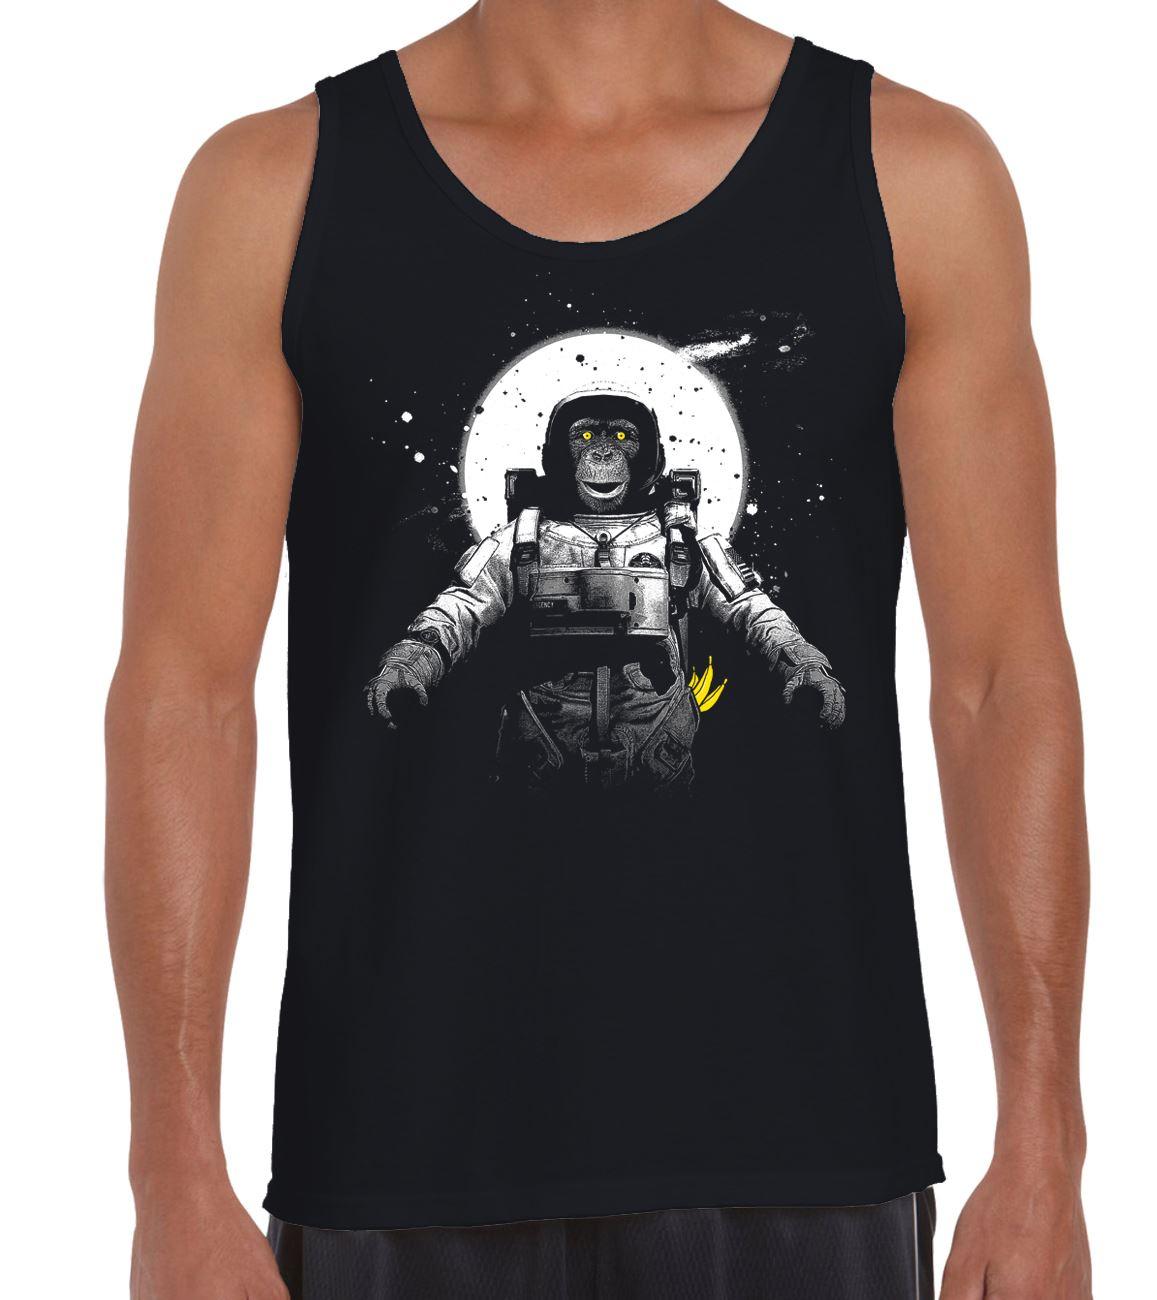 Funny Space Chimpanzee Astronaut Monkey Men/'s Vest Tank Top